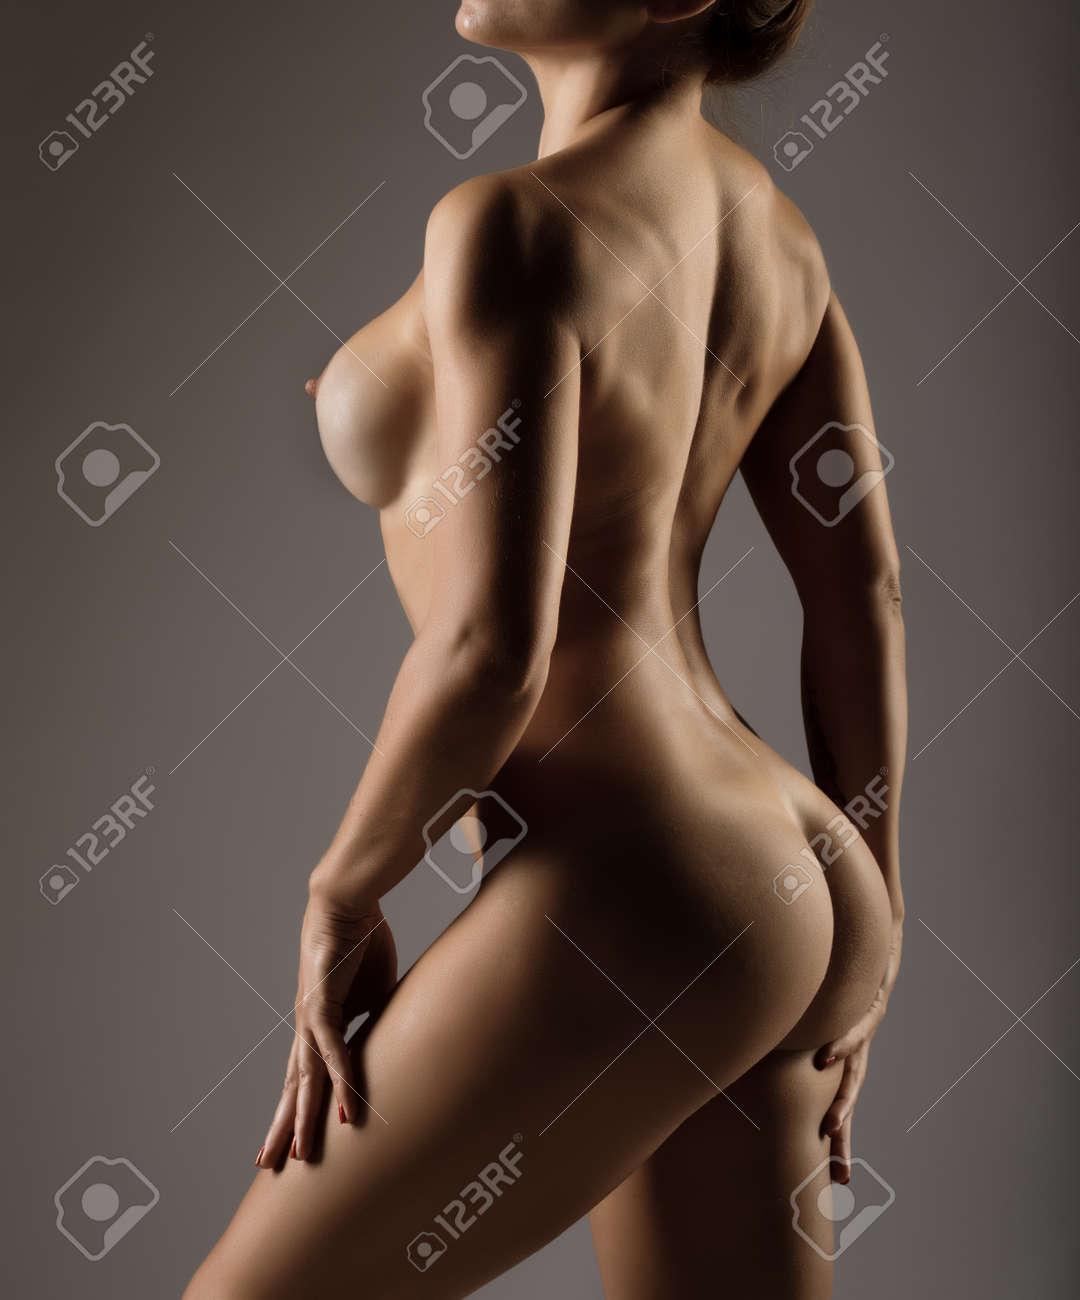 Art erotic male photo